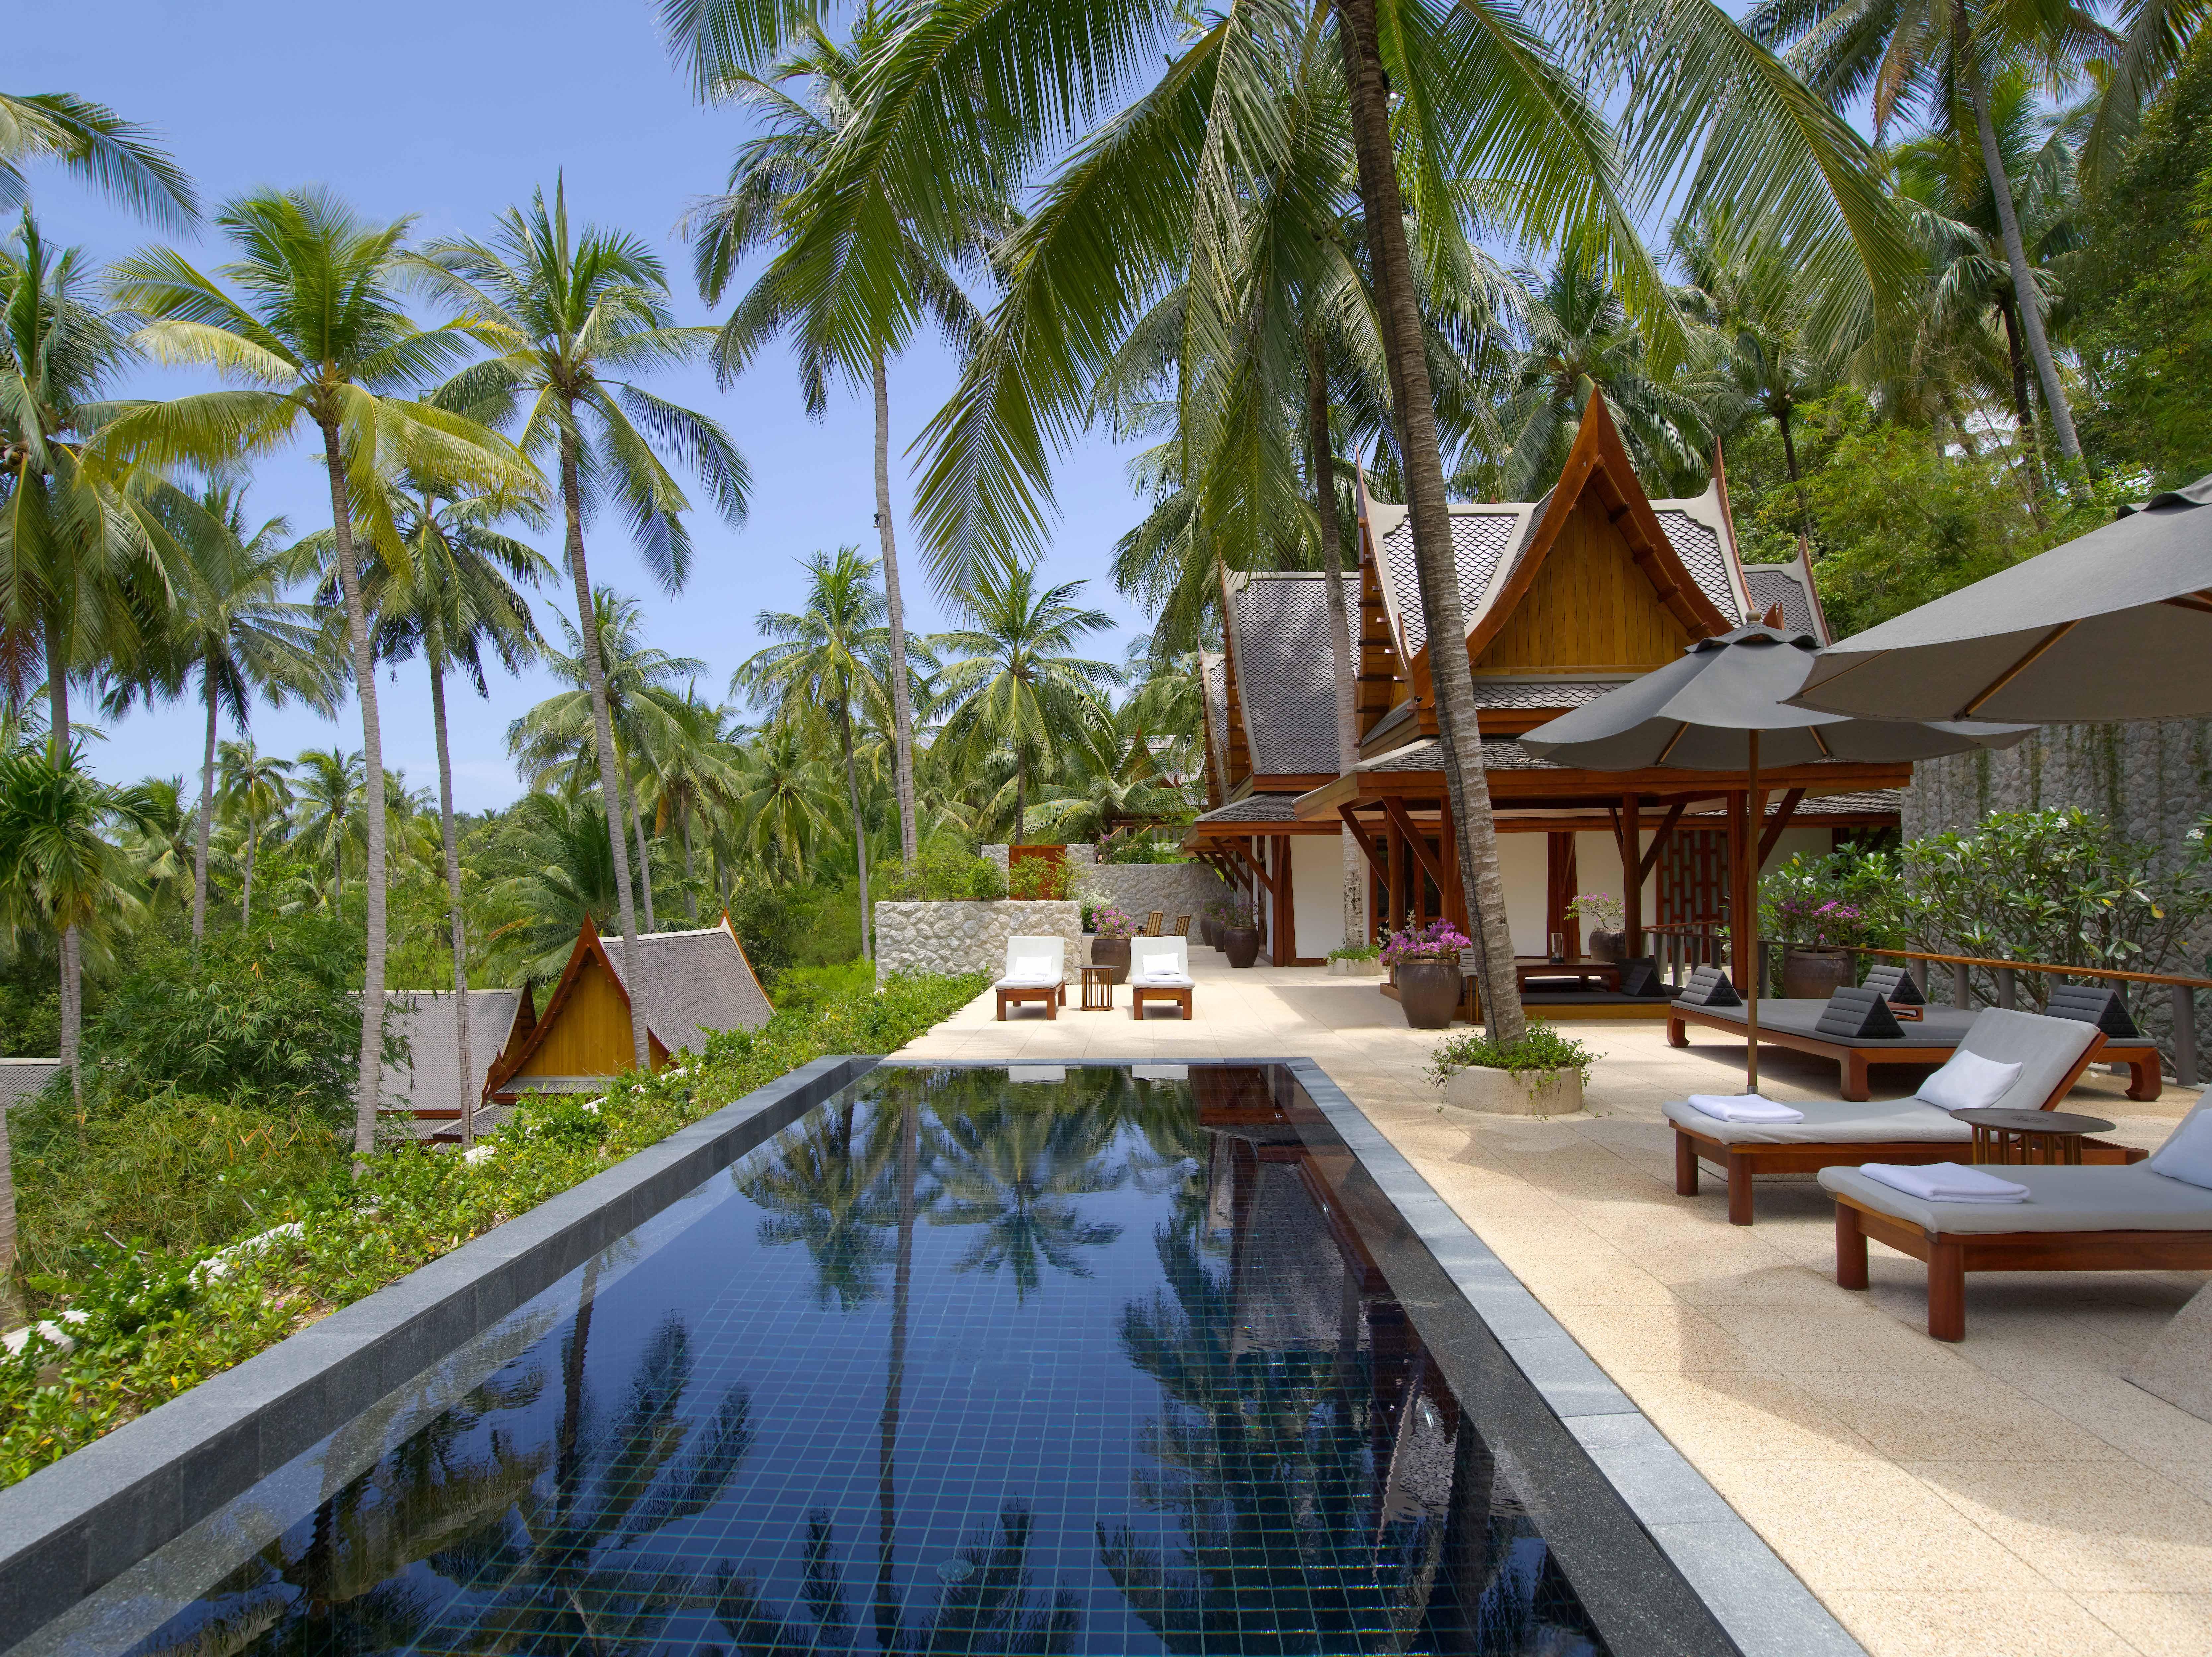 resort lounge pool area